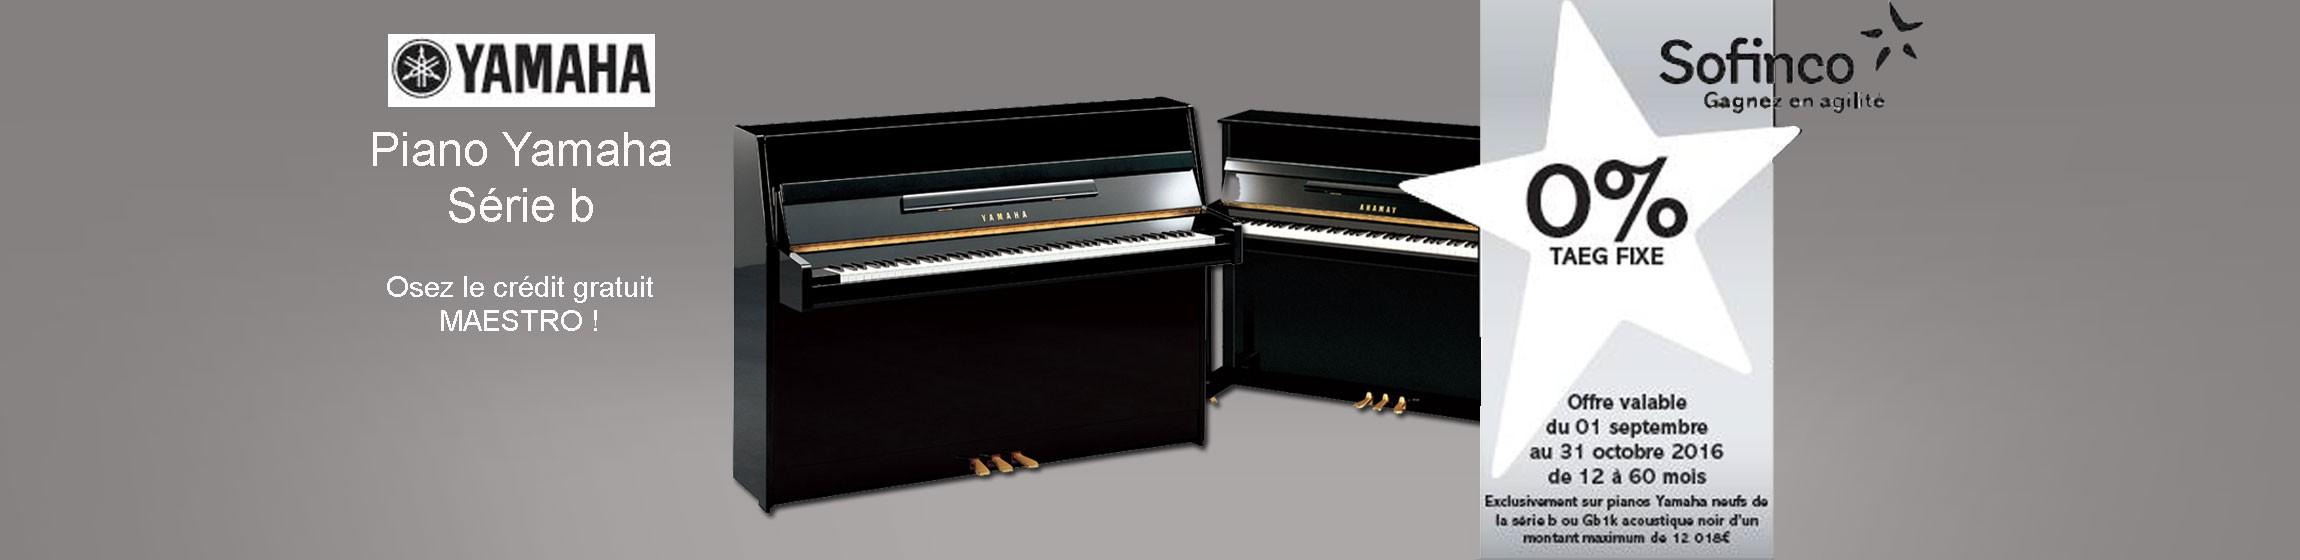 PIANO YAMAHA SERIE B CREDIT GRATUIT